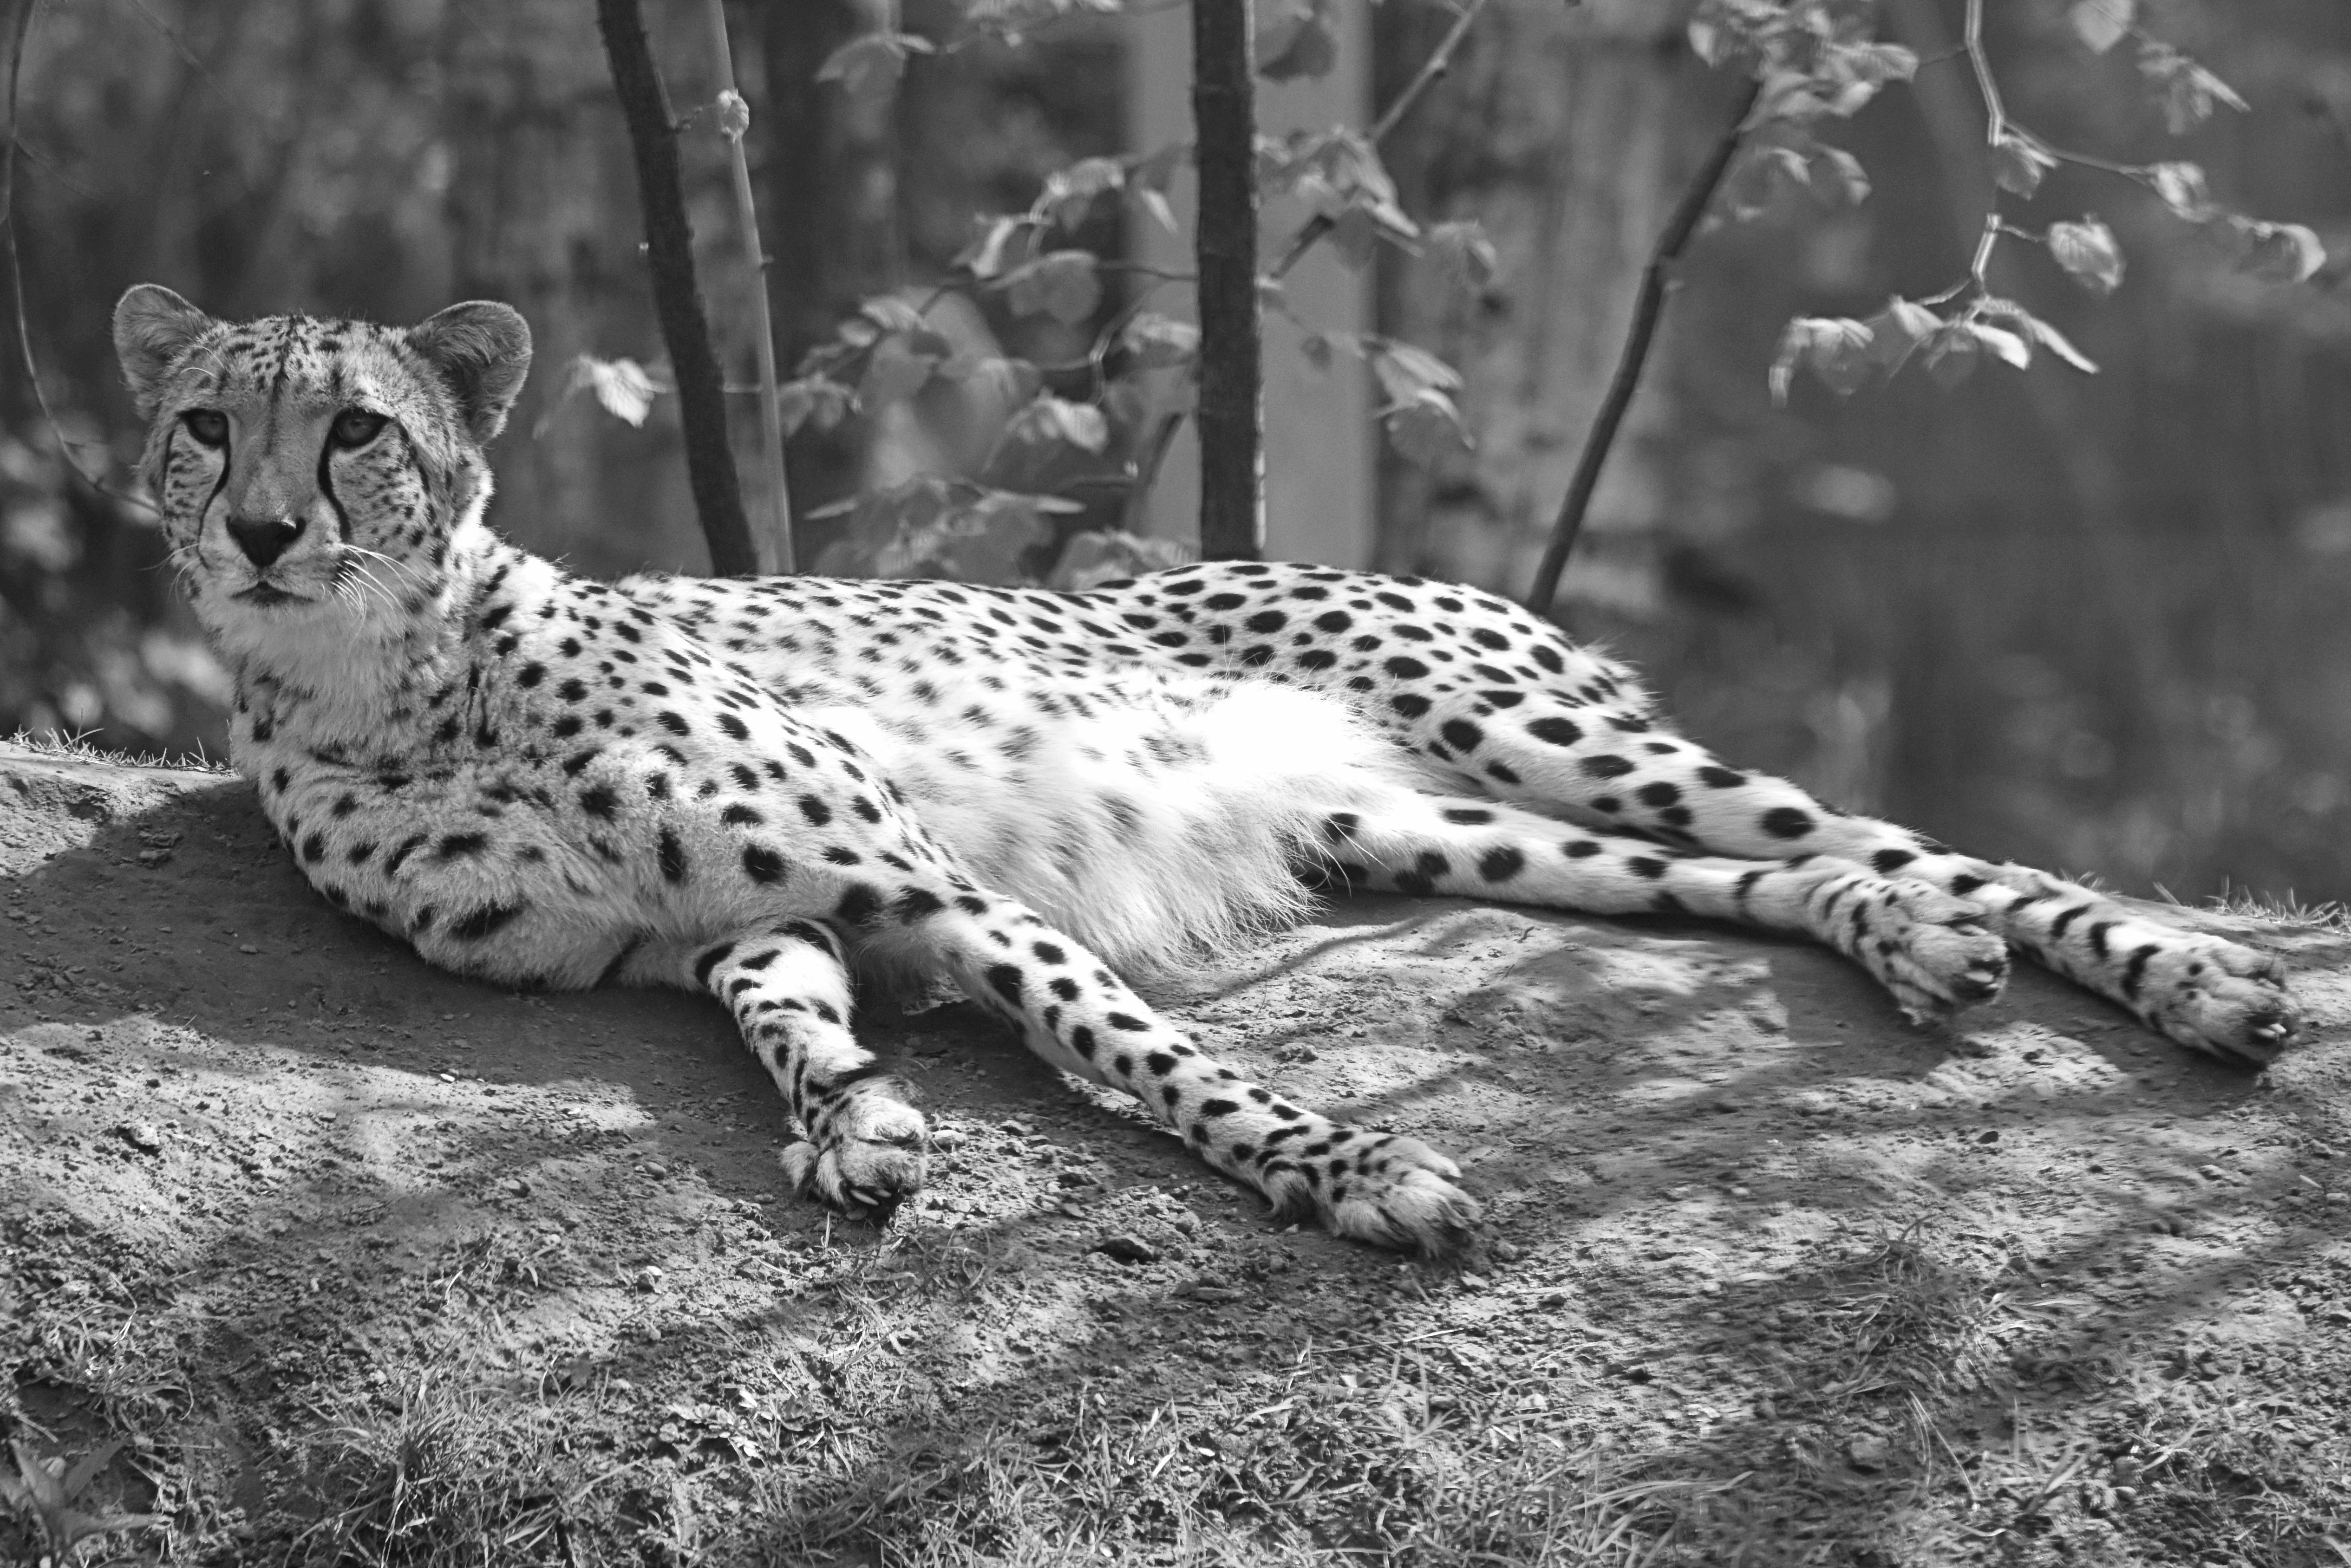 Free Images : nature, black and white, animal, wildlife ...